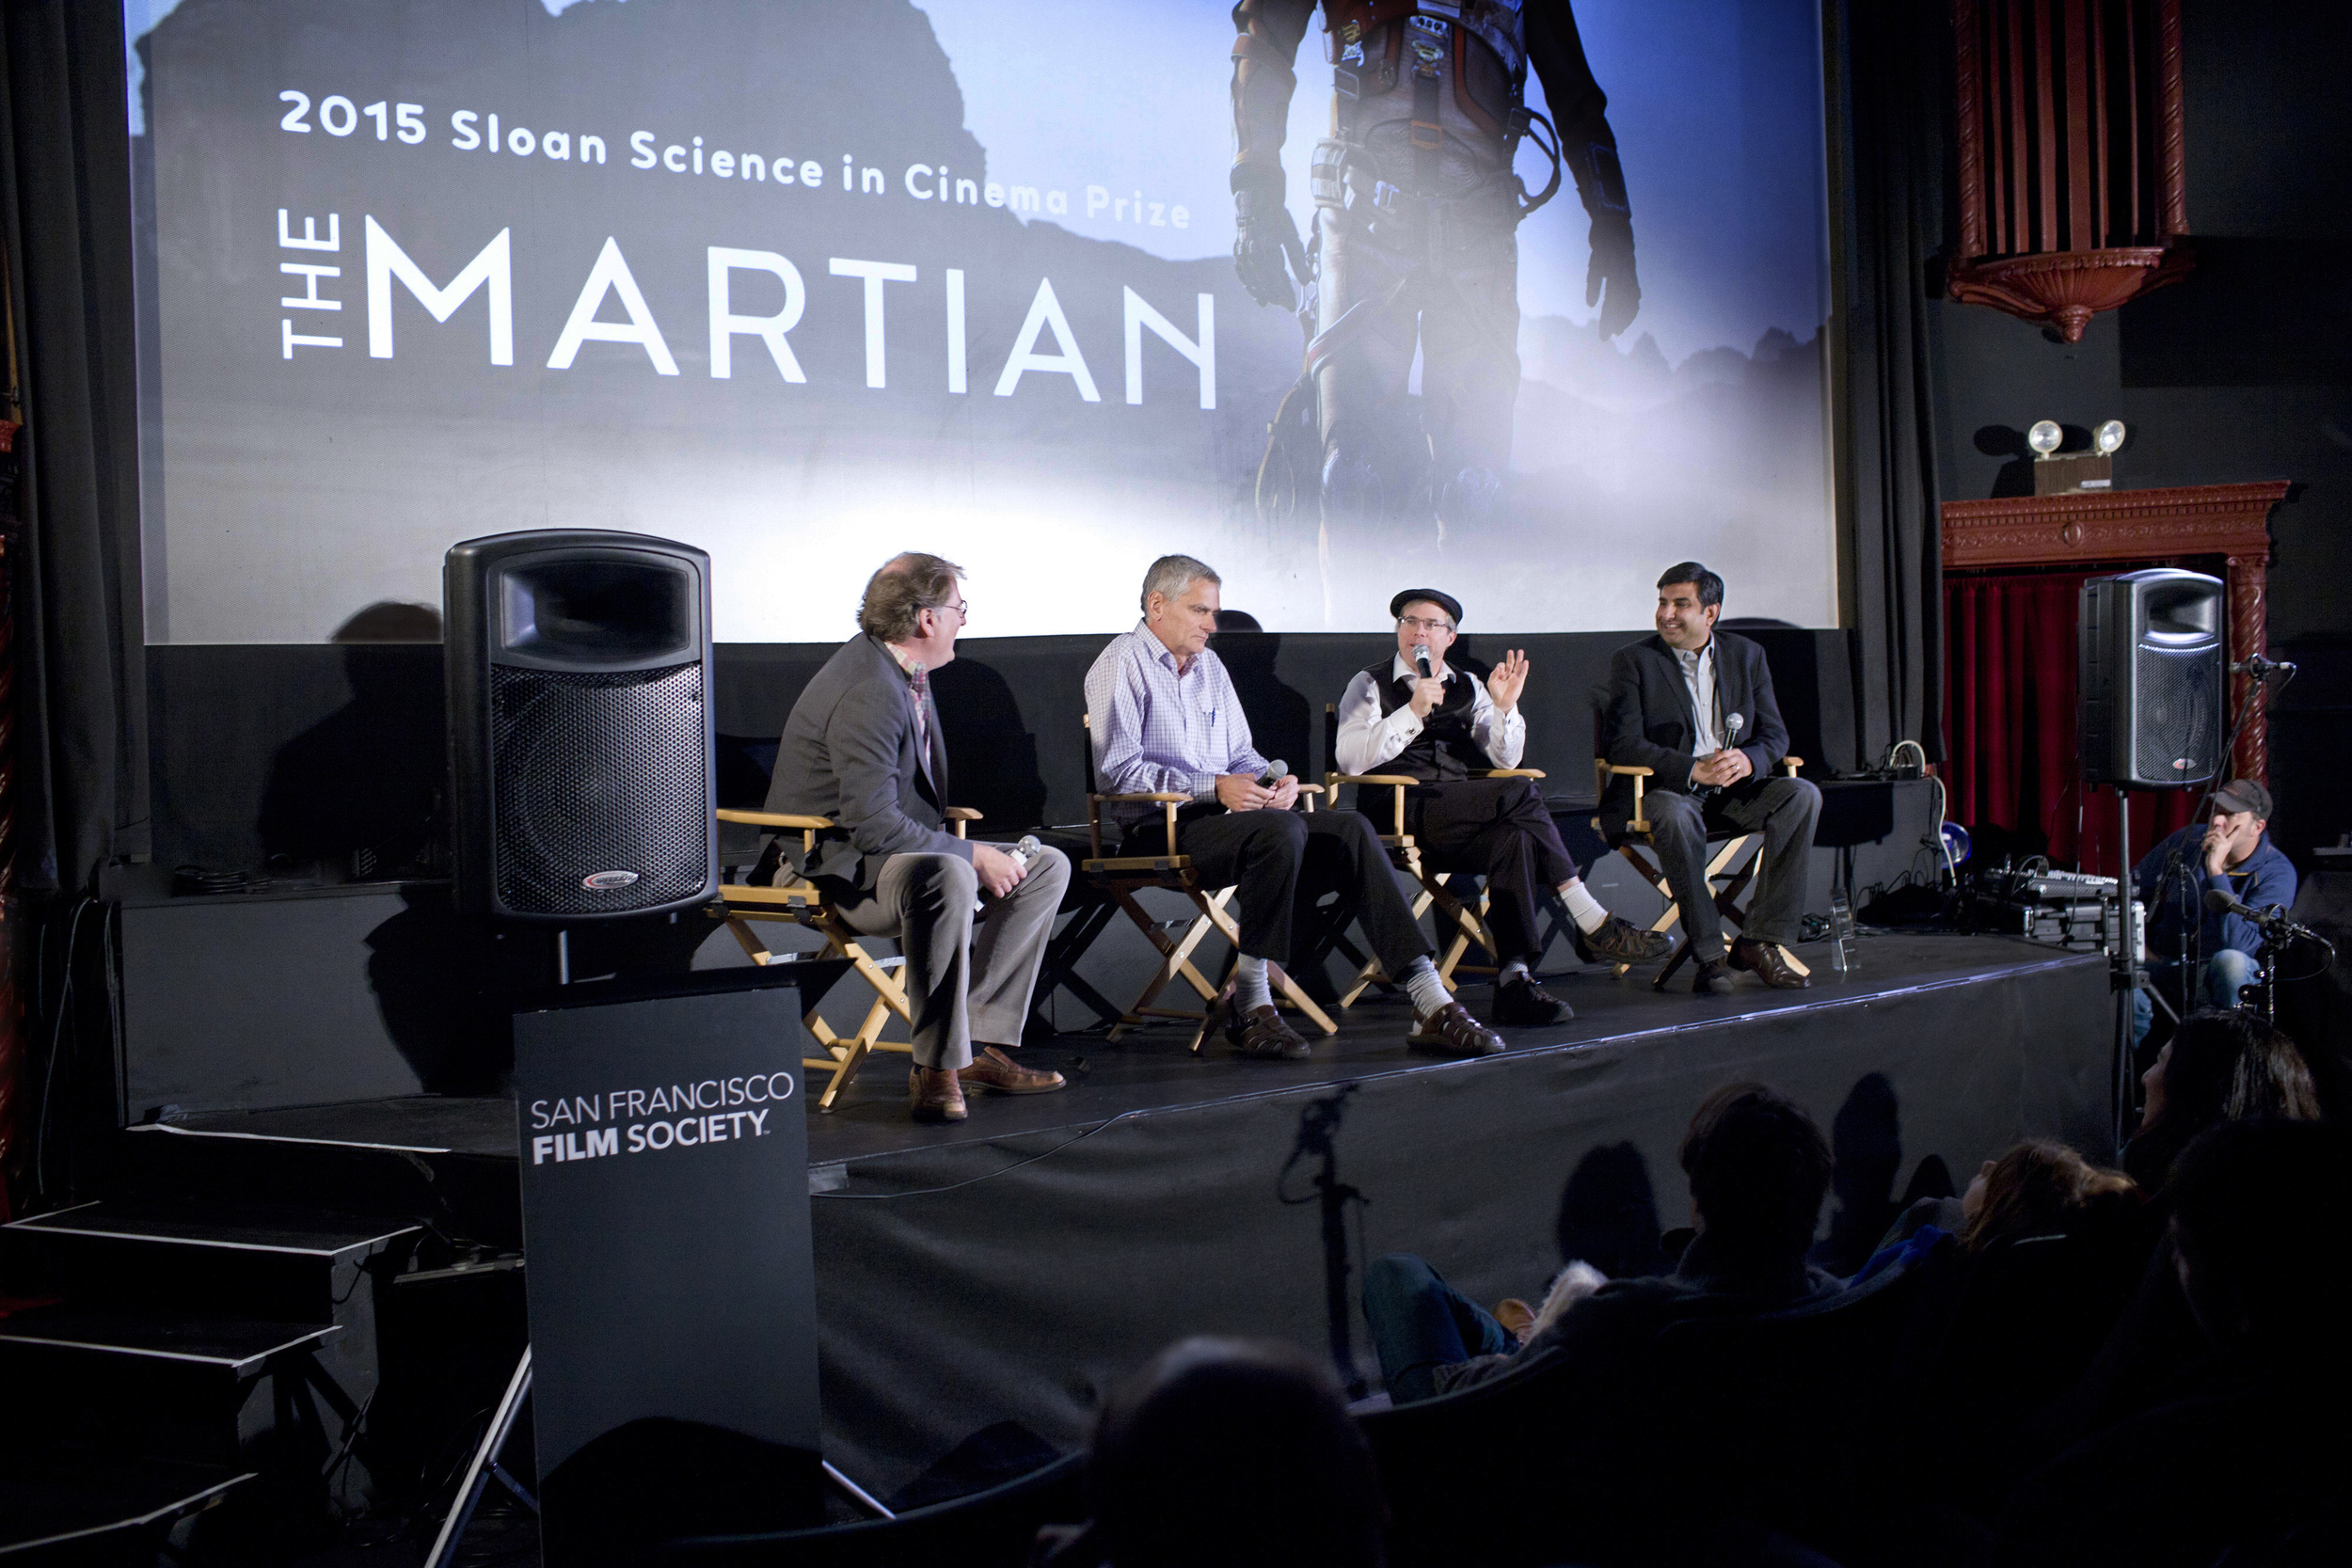 Science in Cinema: The Martian